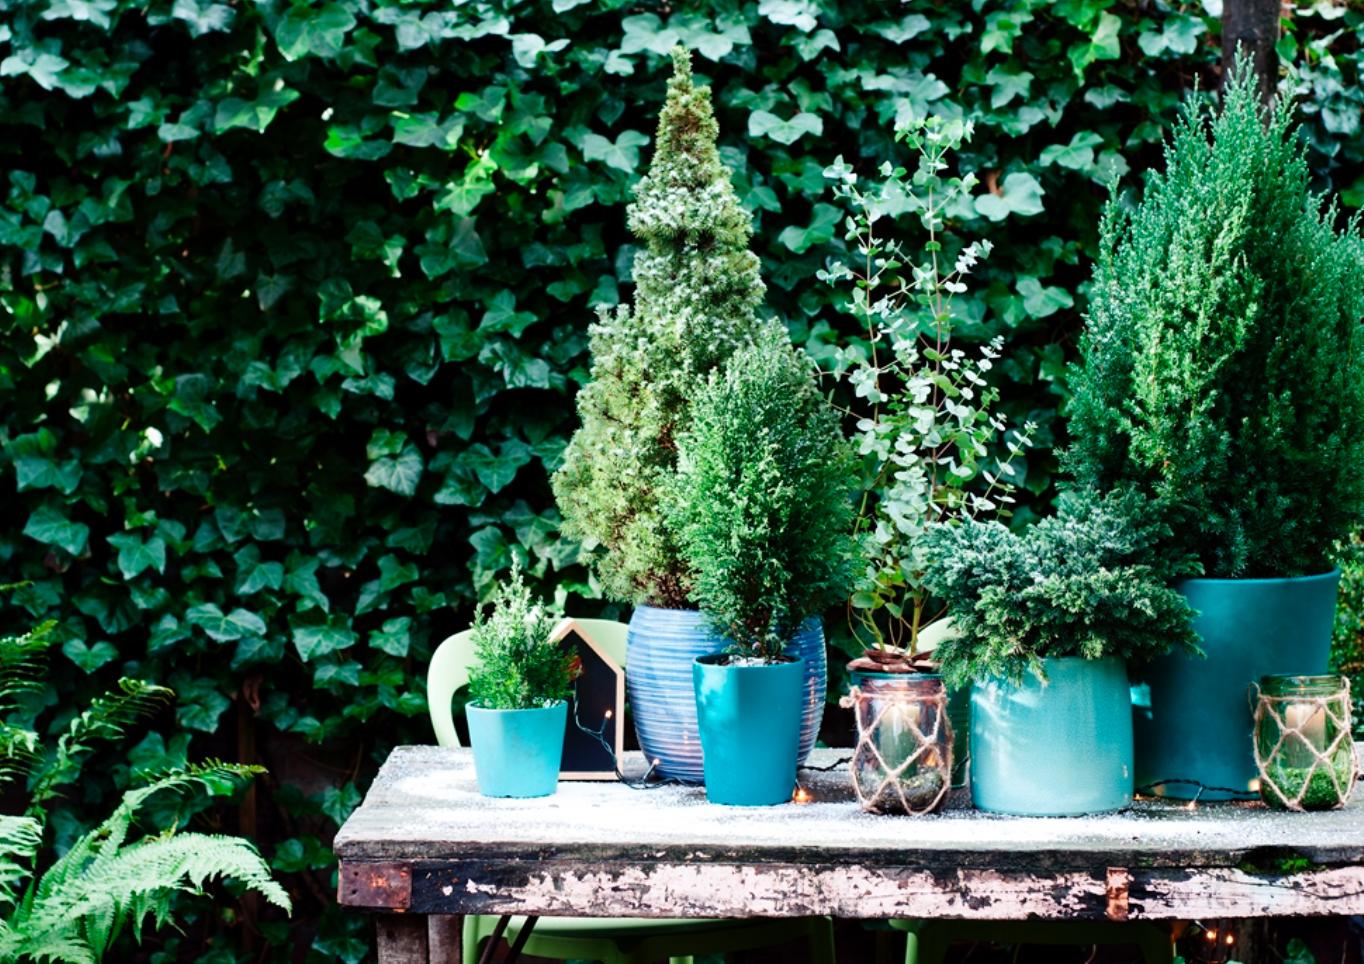 Wintertuin Archieven • Stijlvol Styling - Woonblog •